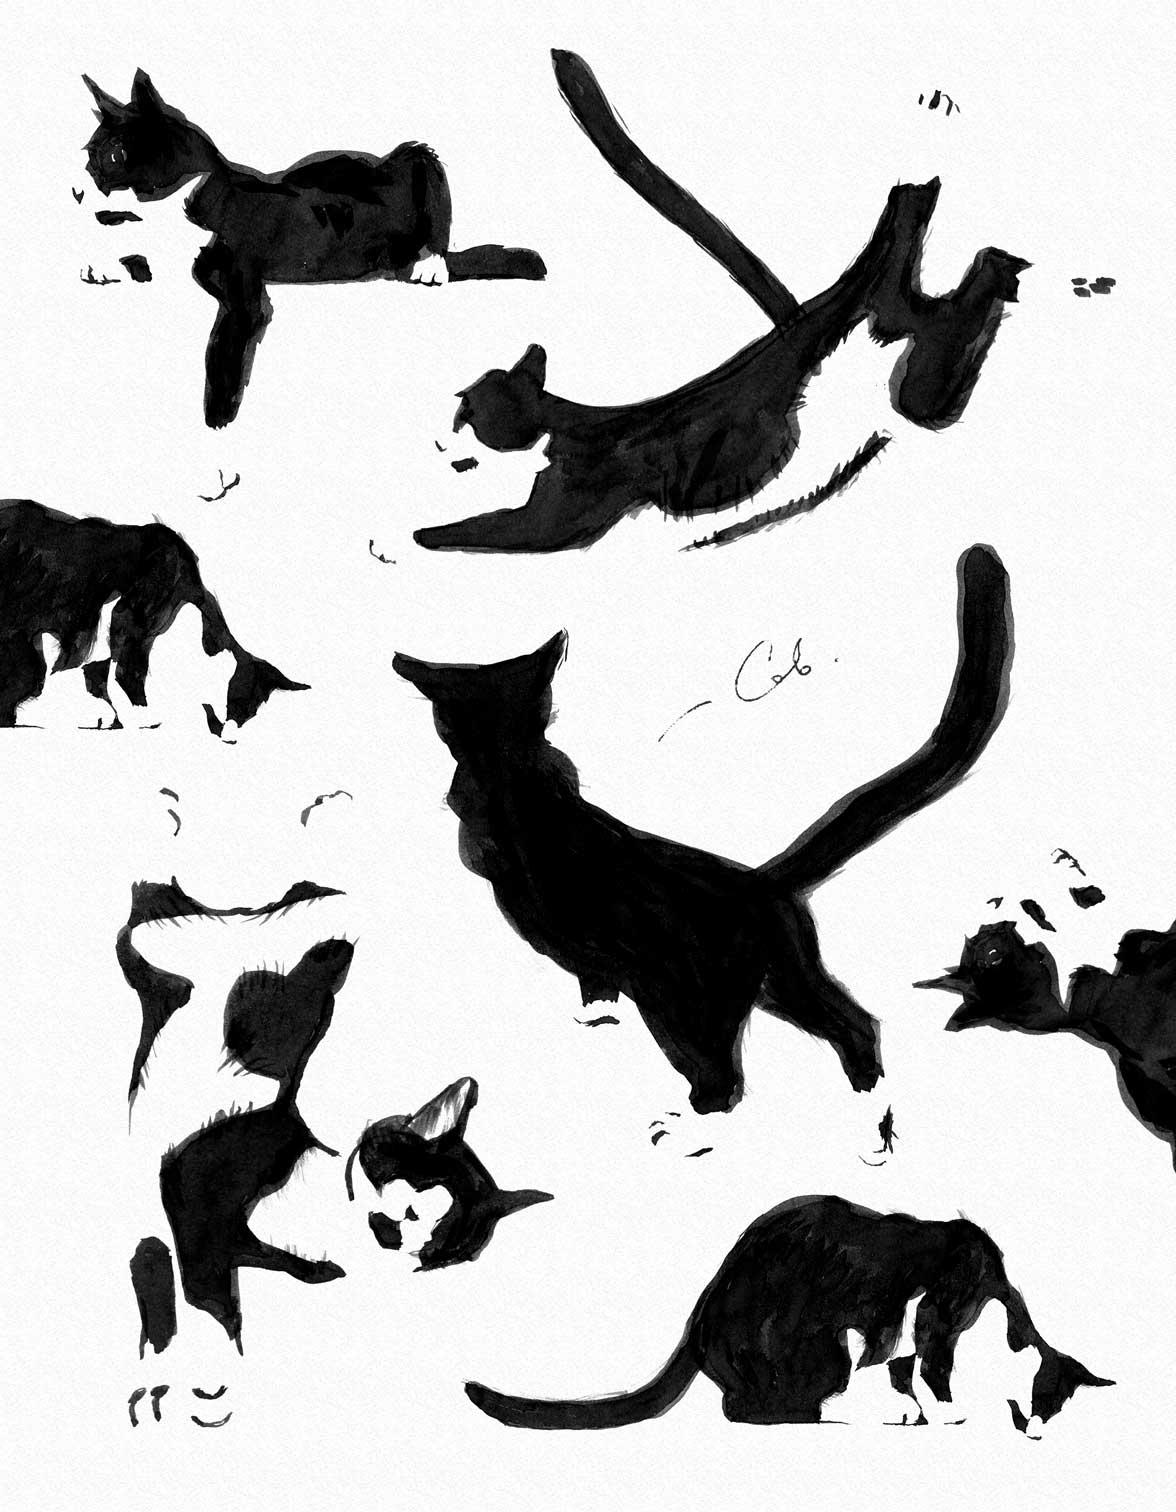 Kosatiki 2018, papir, blekk, 70x90, кот, katt